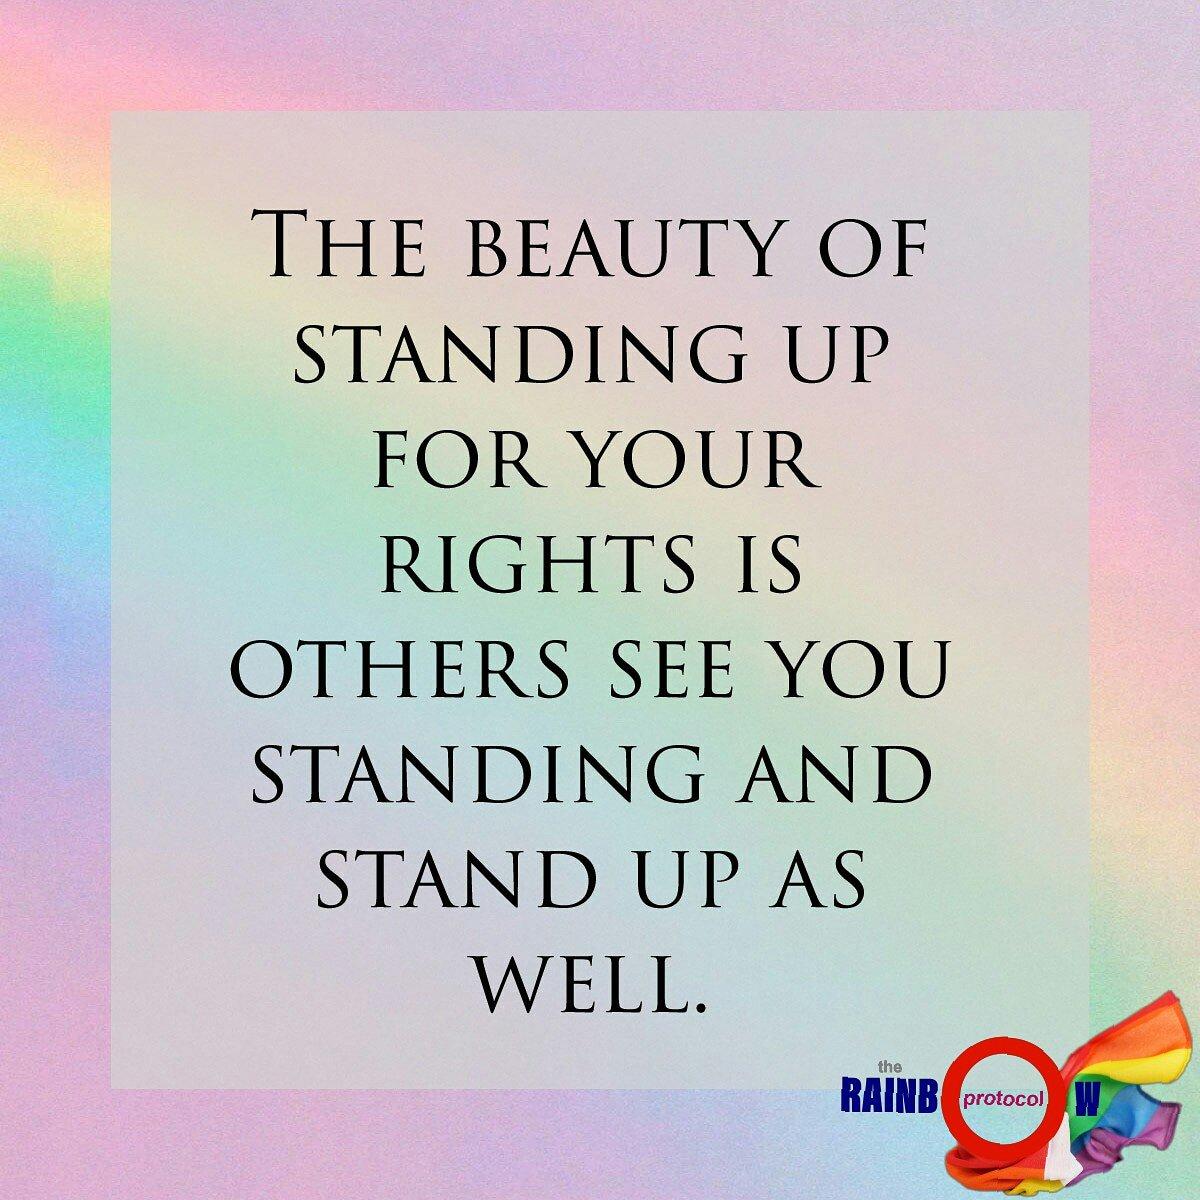 Lesbian Gay Bisexual Bi Lgbt Pride Loveislove Noh8 Equality